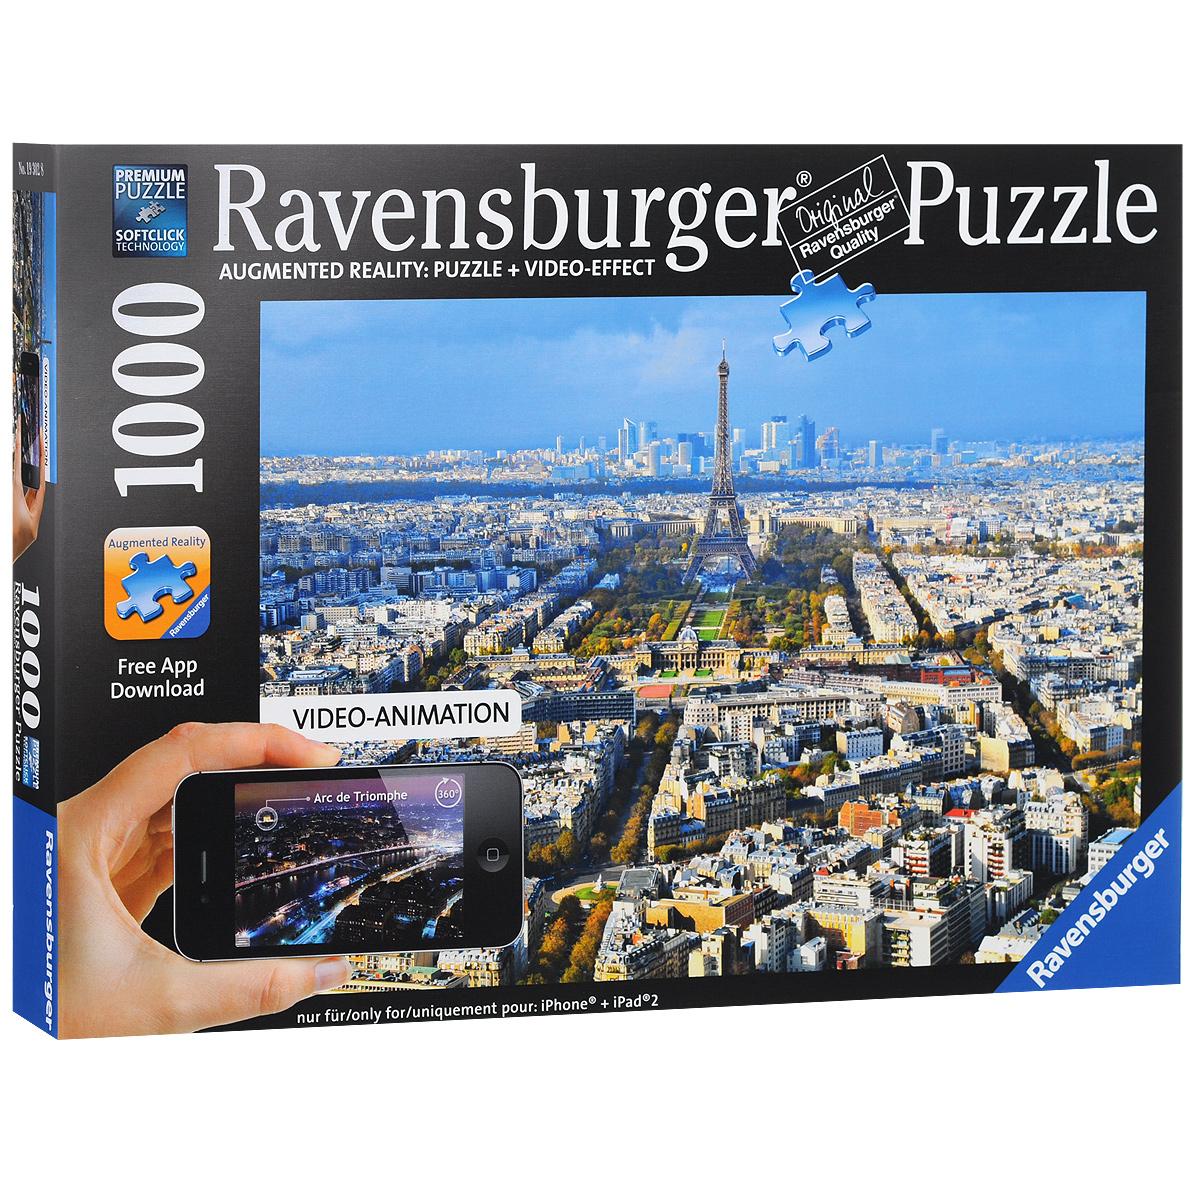 Ravensburger Крыши Парижа. Пазл с видео-анимацией, 1000 элементов